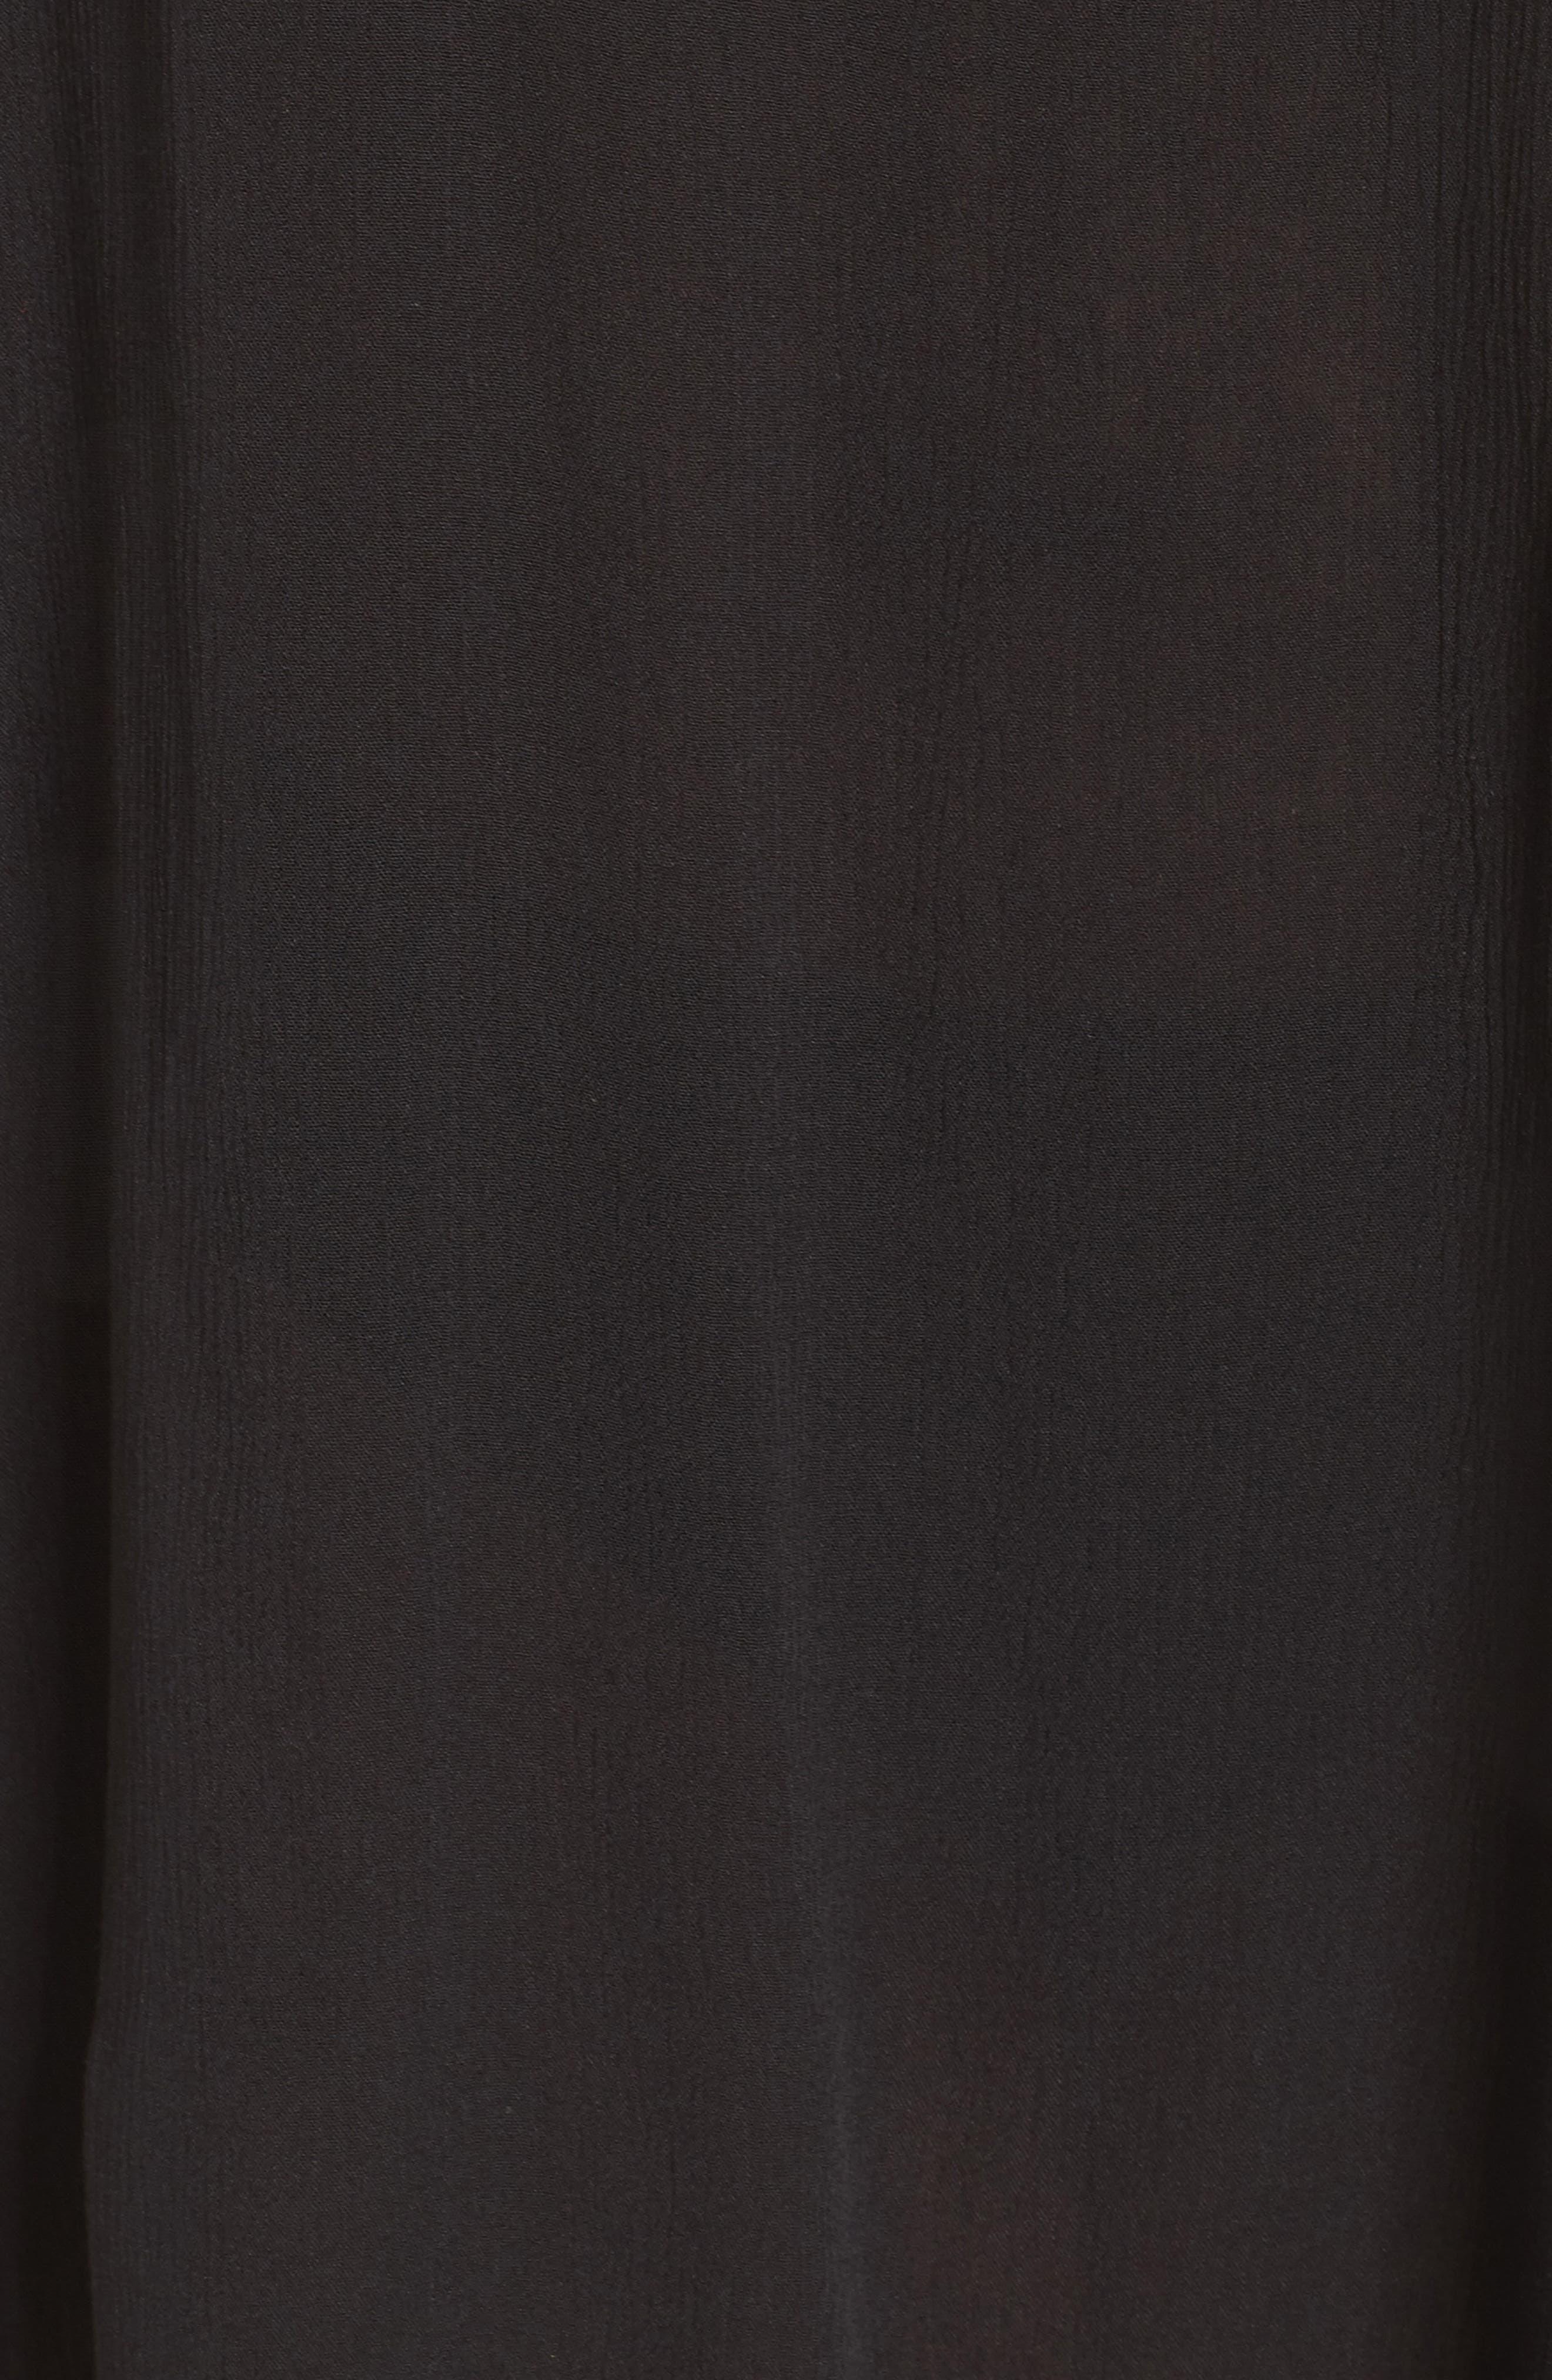 Southern Belle Off the Shoulder Cover-Up Dress,                             Alternate thumbnail 5, color,                             001